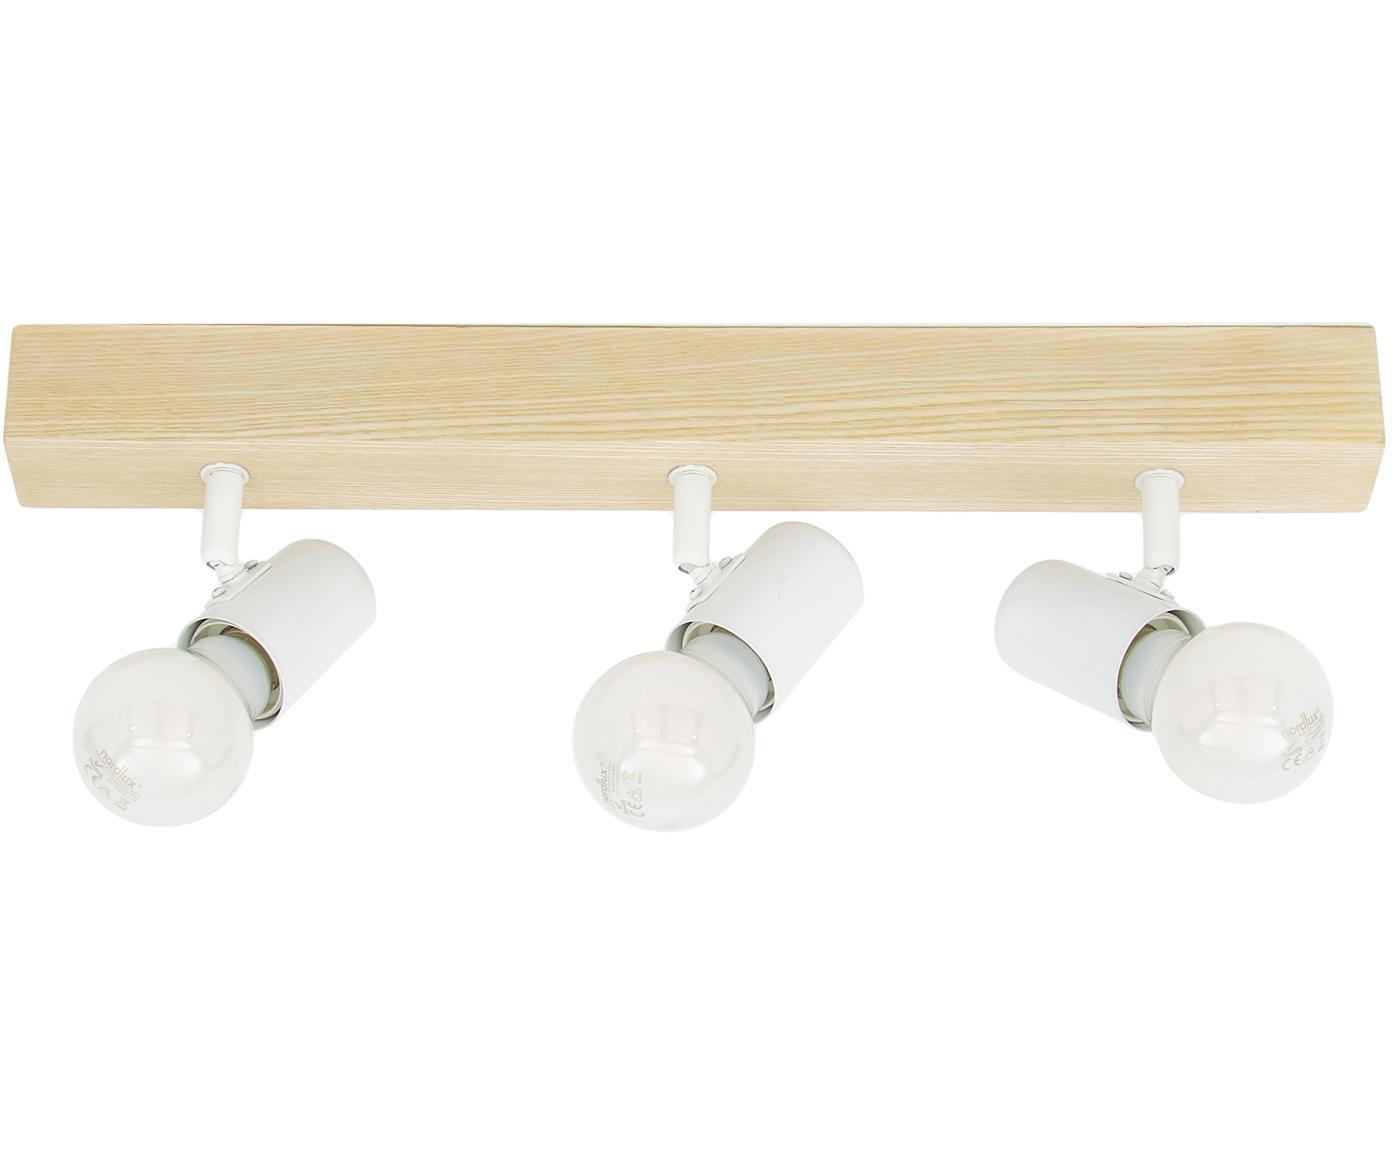 Riel Townshend, Barra: madera, Blanco, madera, An 48 x Al 13 cm